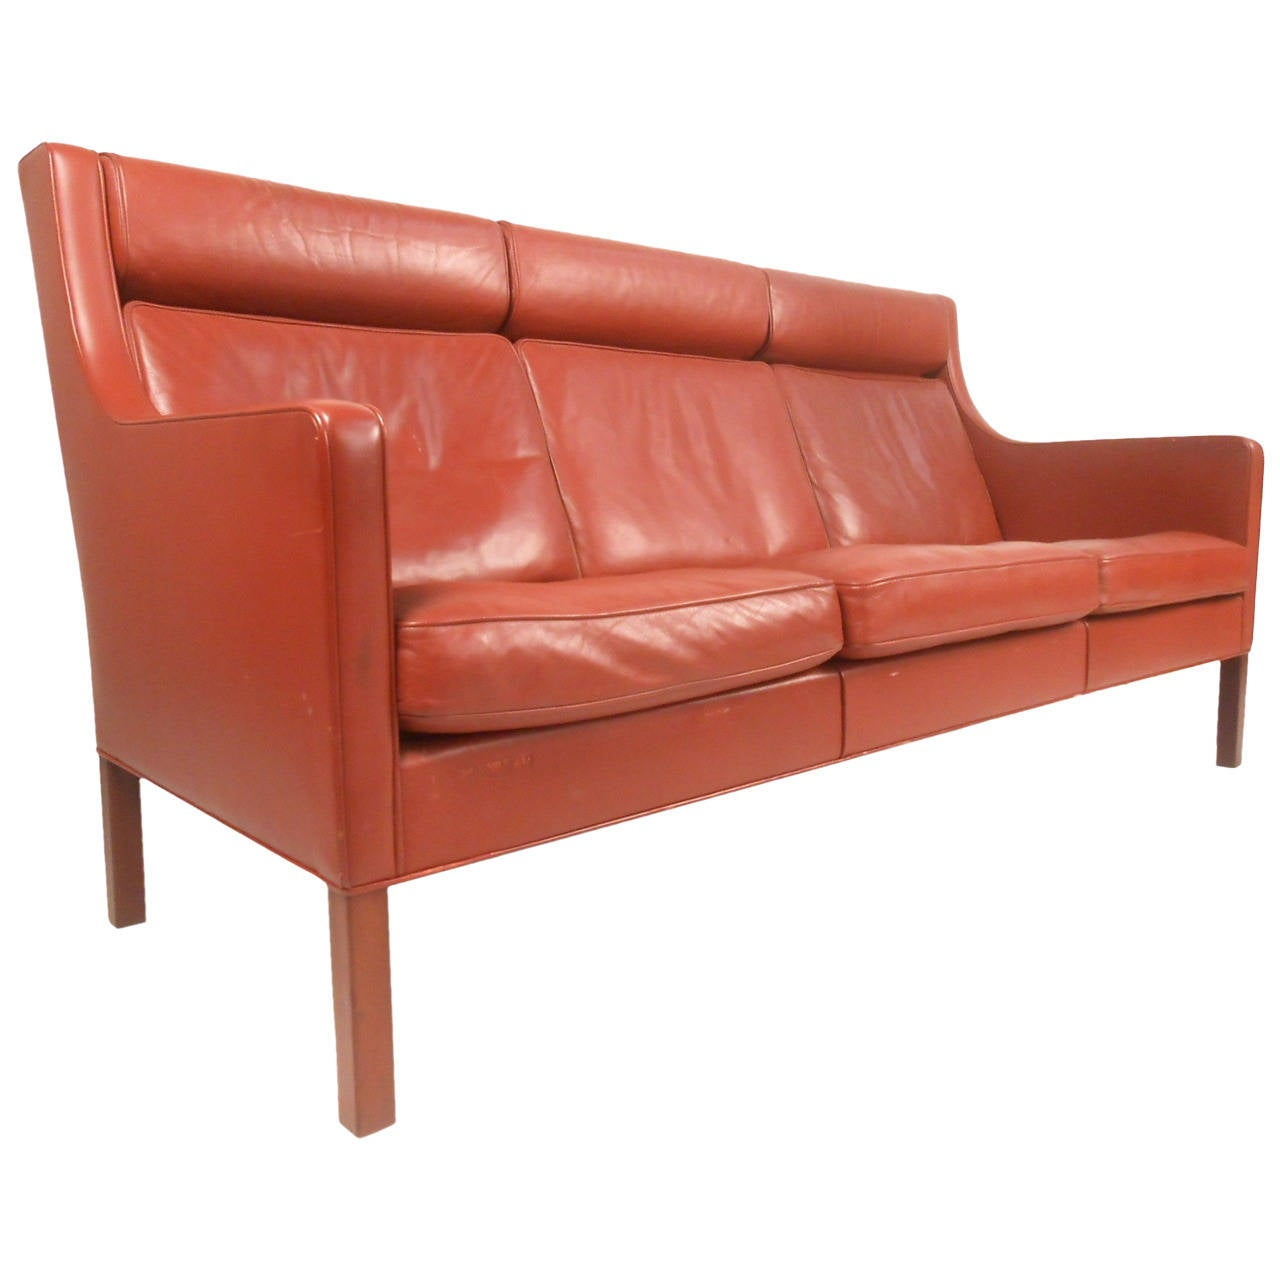 borge mogensen sofa model 2209 office design mid-century modern fredericia by børge for ...